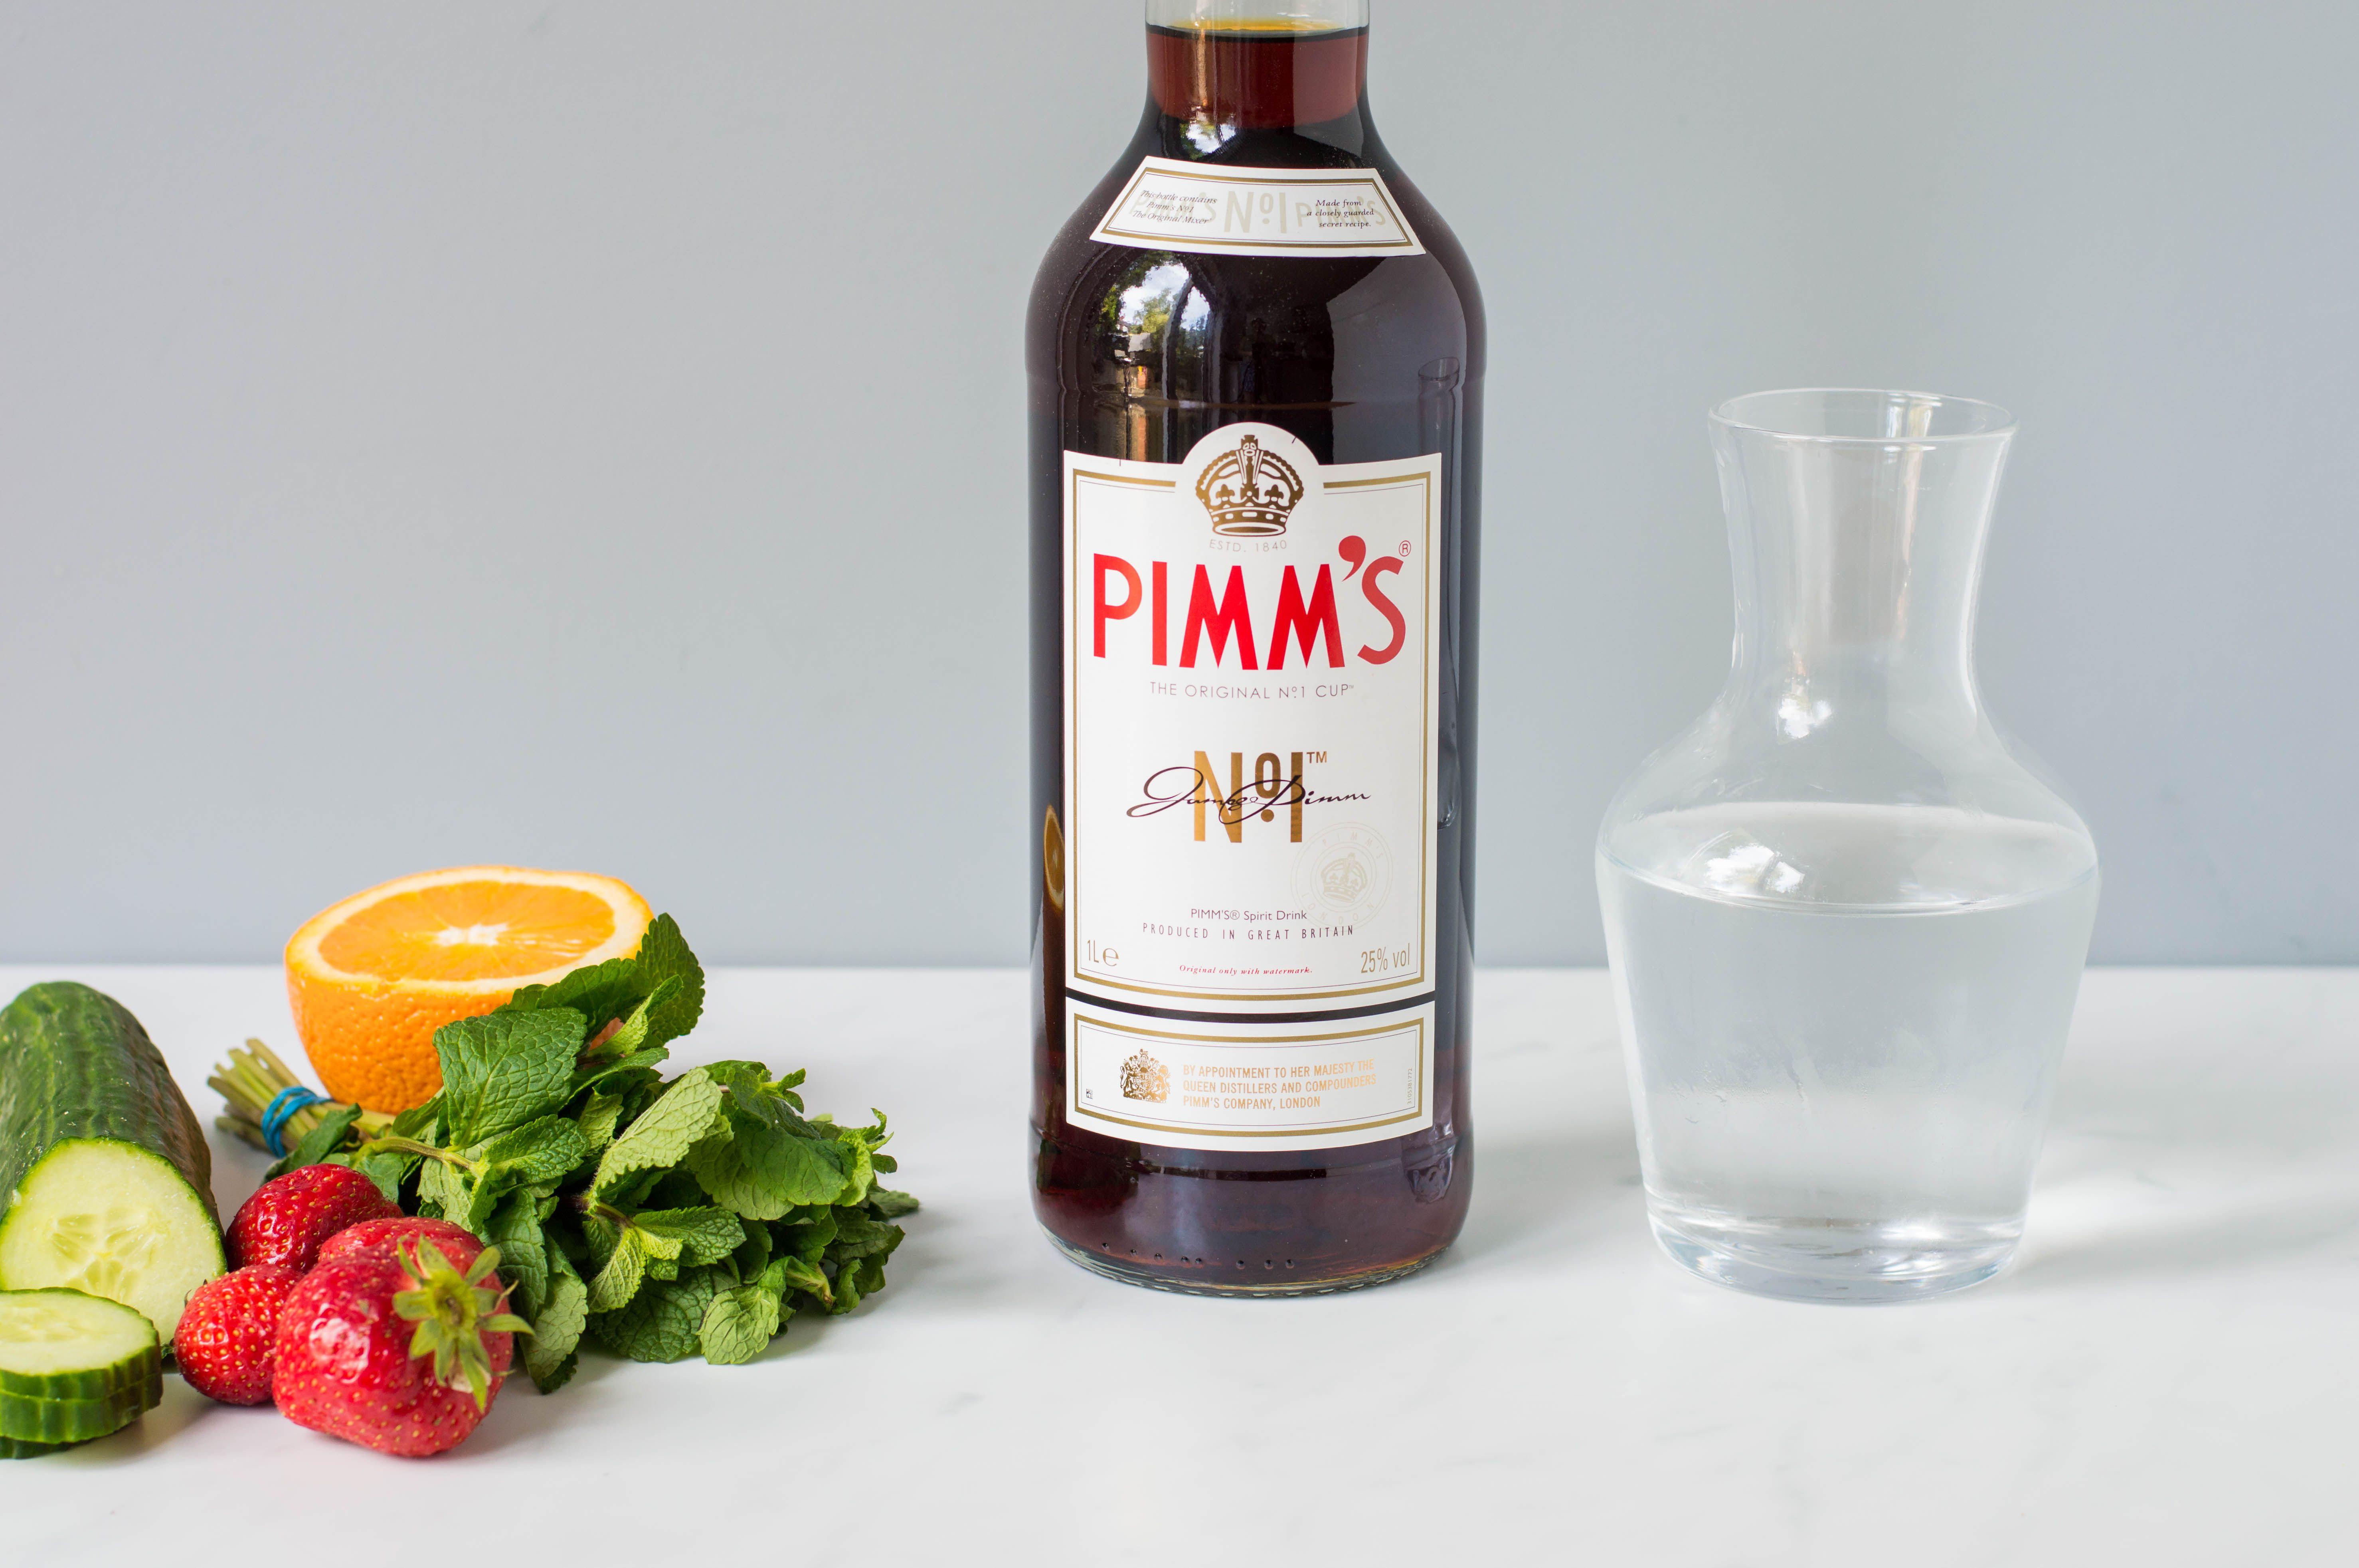 Original Pimms Cup No 1 Cocktail Recipe